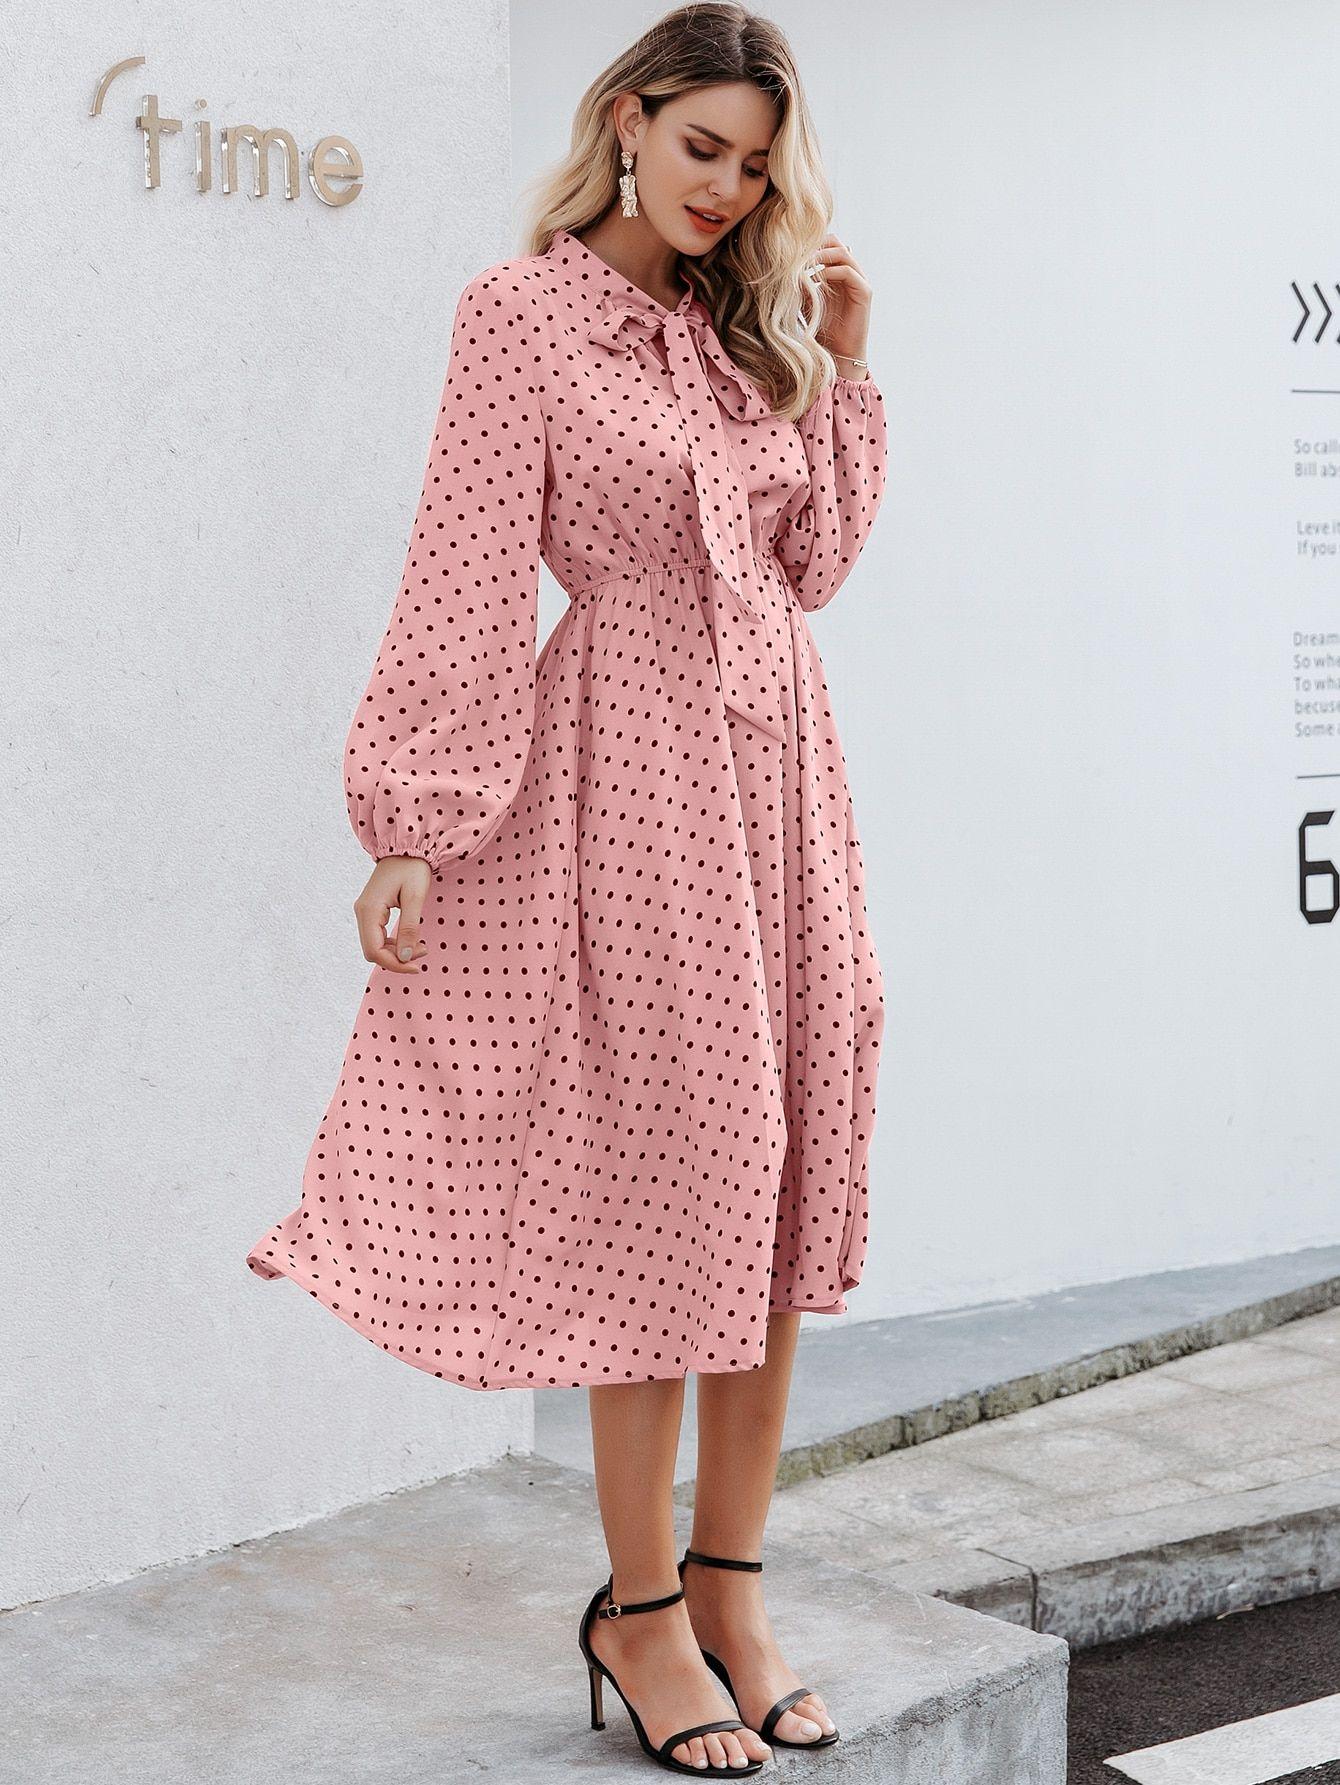 Ad Simplee Tie Neck Lantern Sleeve Polka Dot Dress Tags Elegant Pink Pastel Polka Dot Stand Collar Long A Line Tie Neck Fashion Boho Fashion Dresses [ 1785 x 1340 Pixel ]